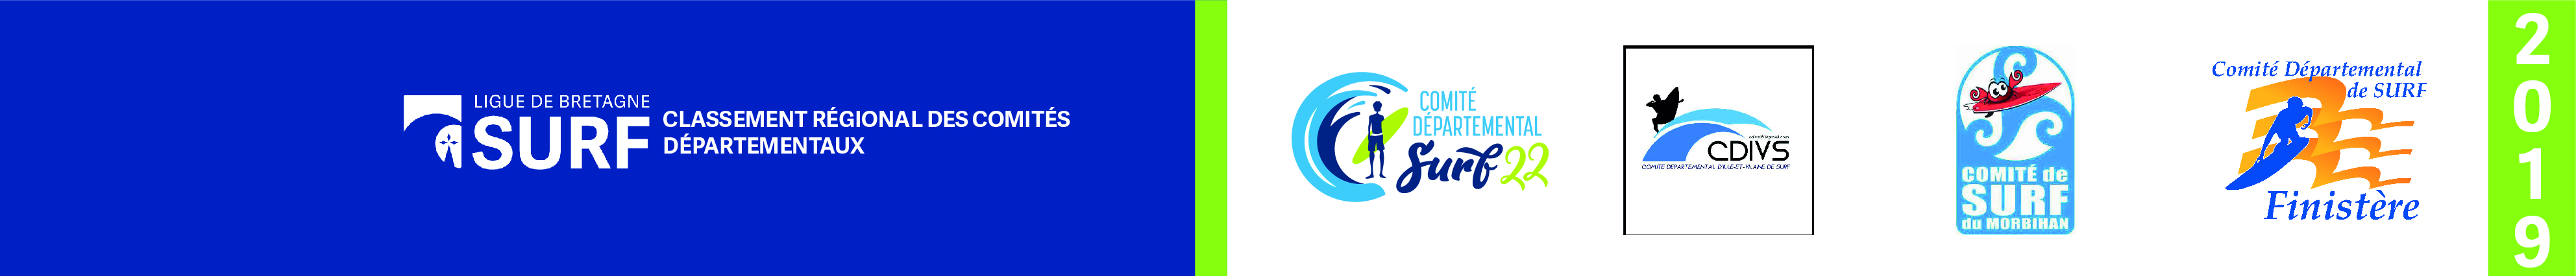 https://www.ligue-bretagne-surf.bzh/wp-content/uploads/2019/03/Visuel-Classement-ComitésD.jpg